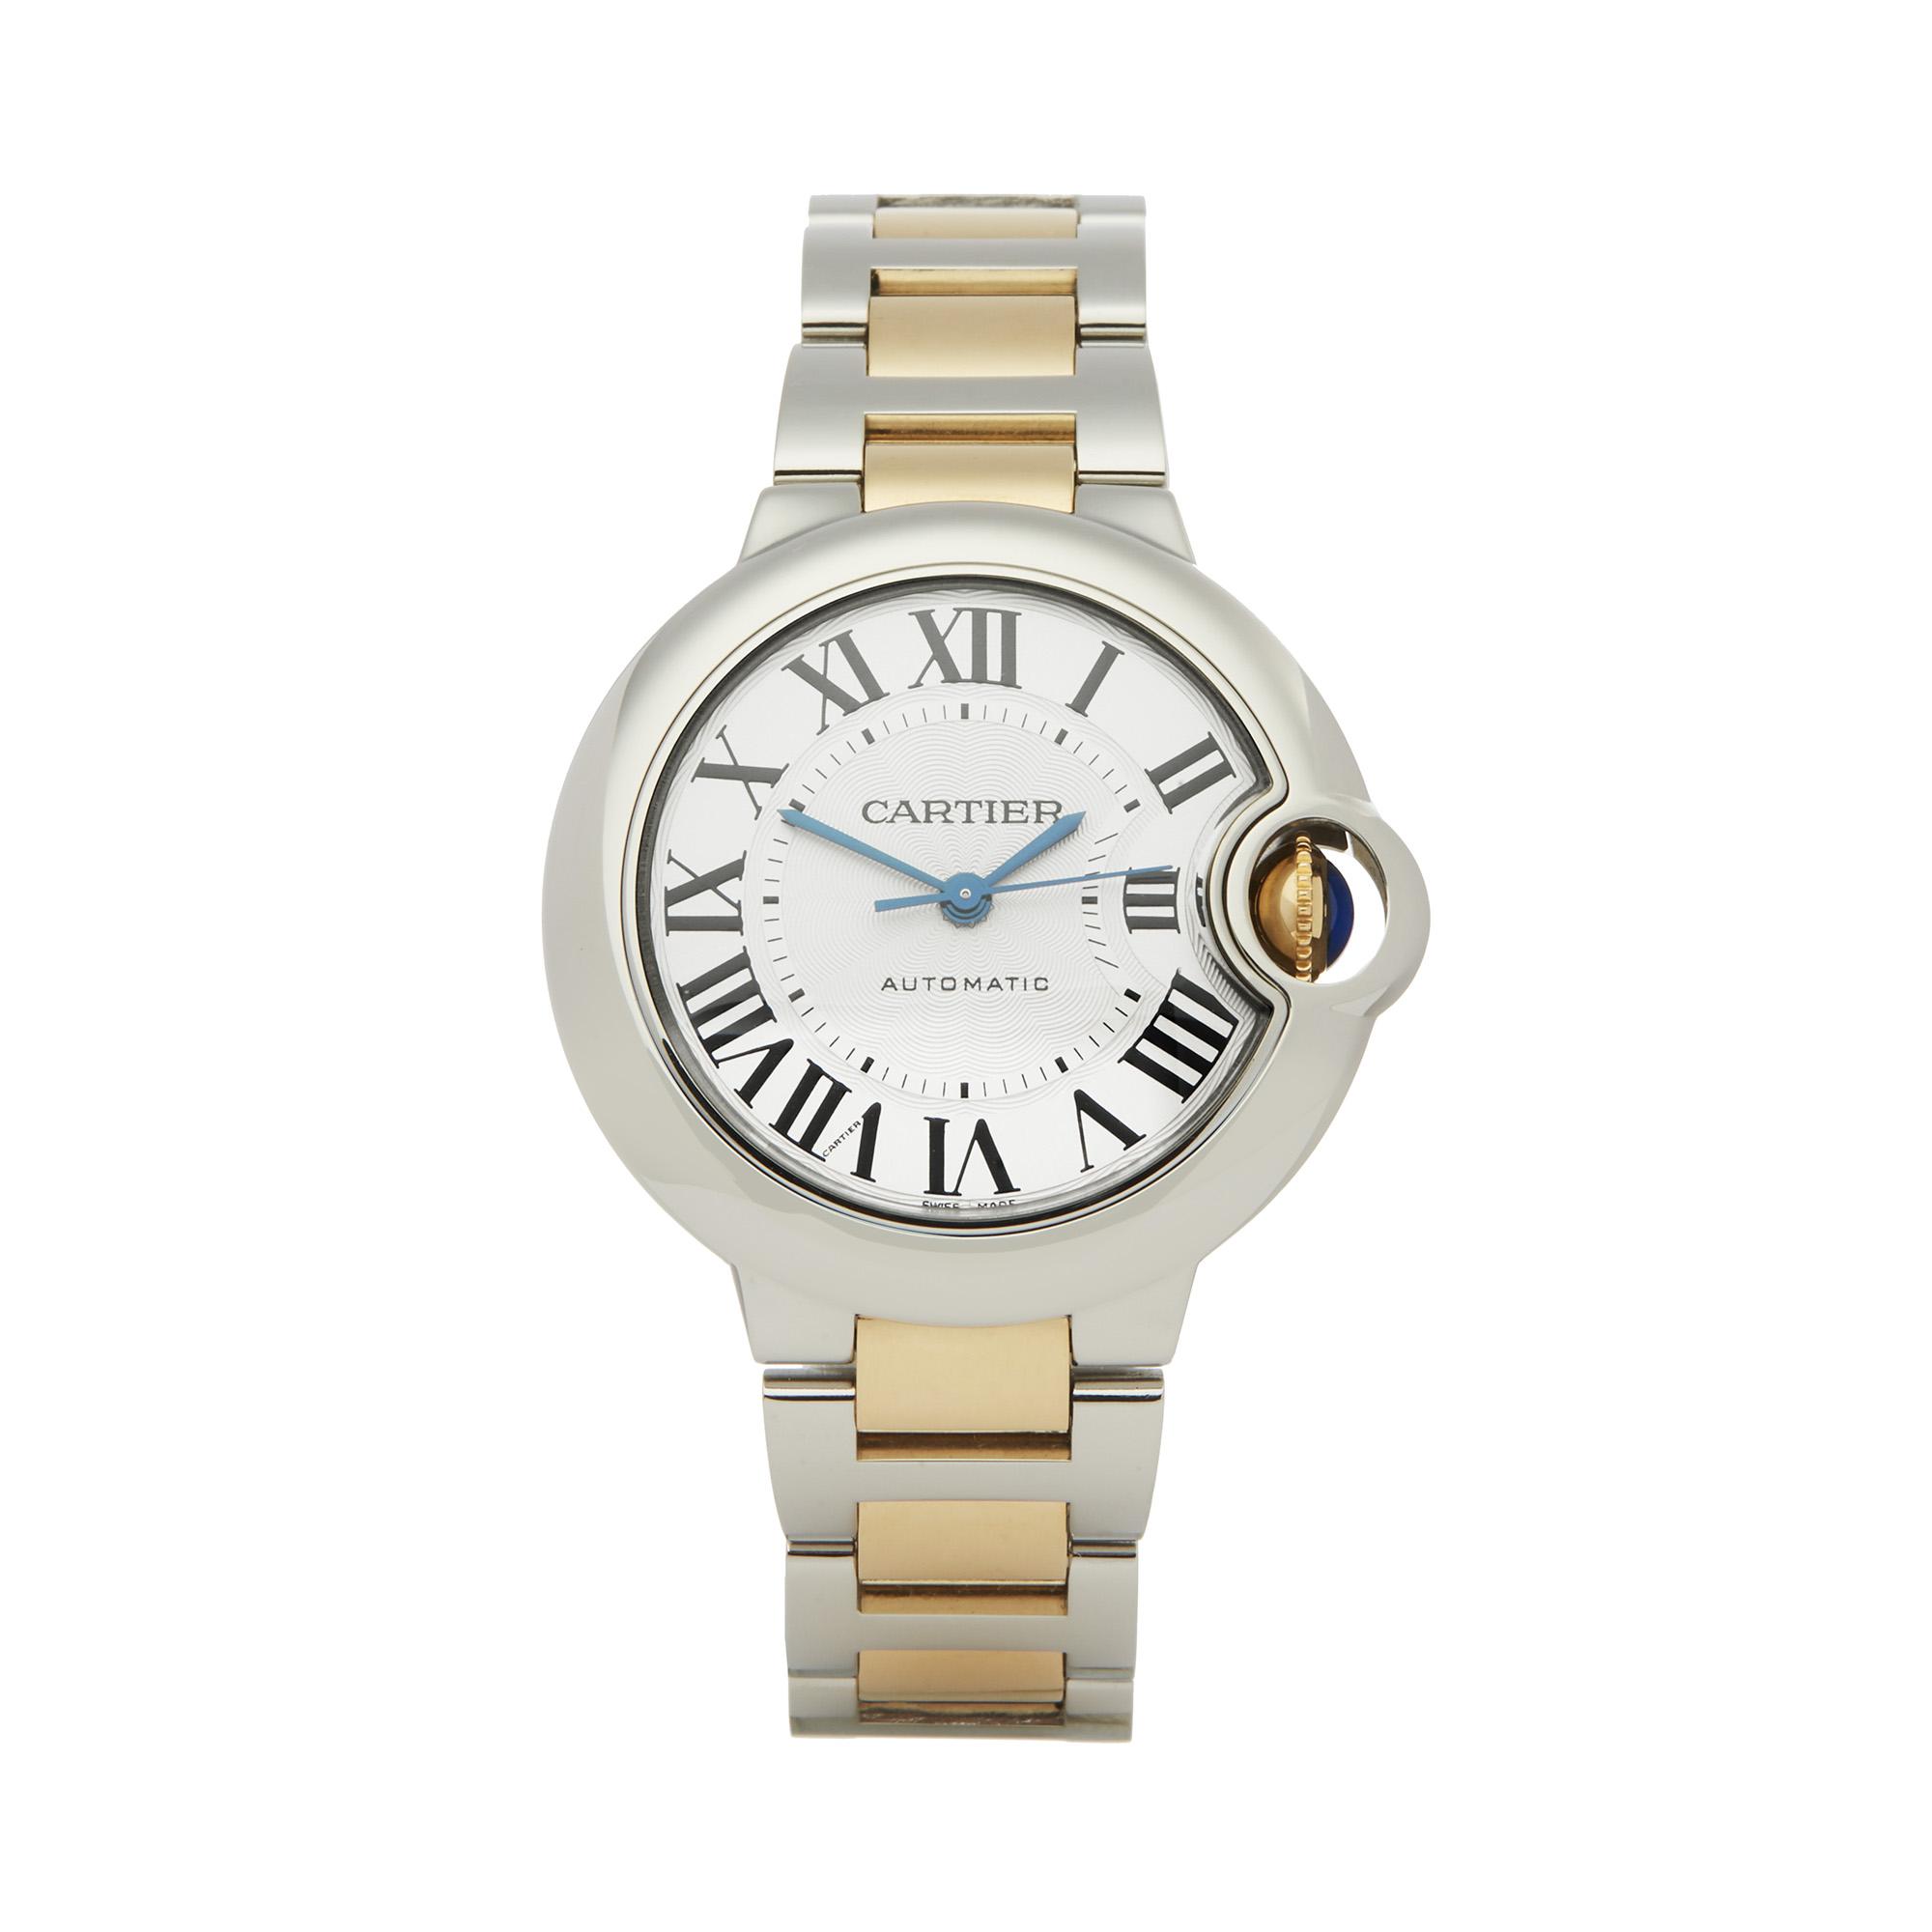 Cartier Ballon Bleu 3489 Ladies Stainless Steel & Yellow Gold Watch - Image 8 of 8